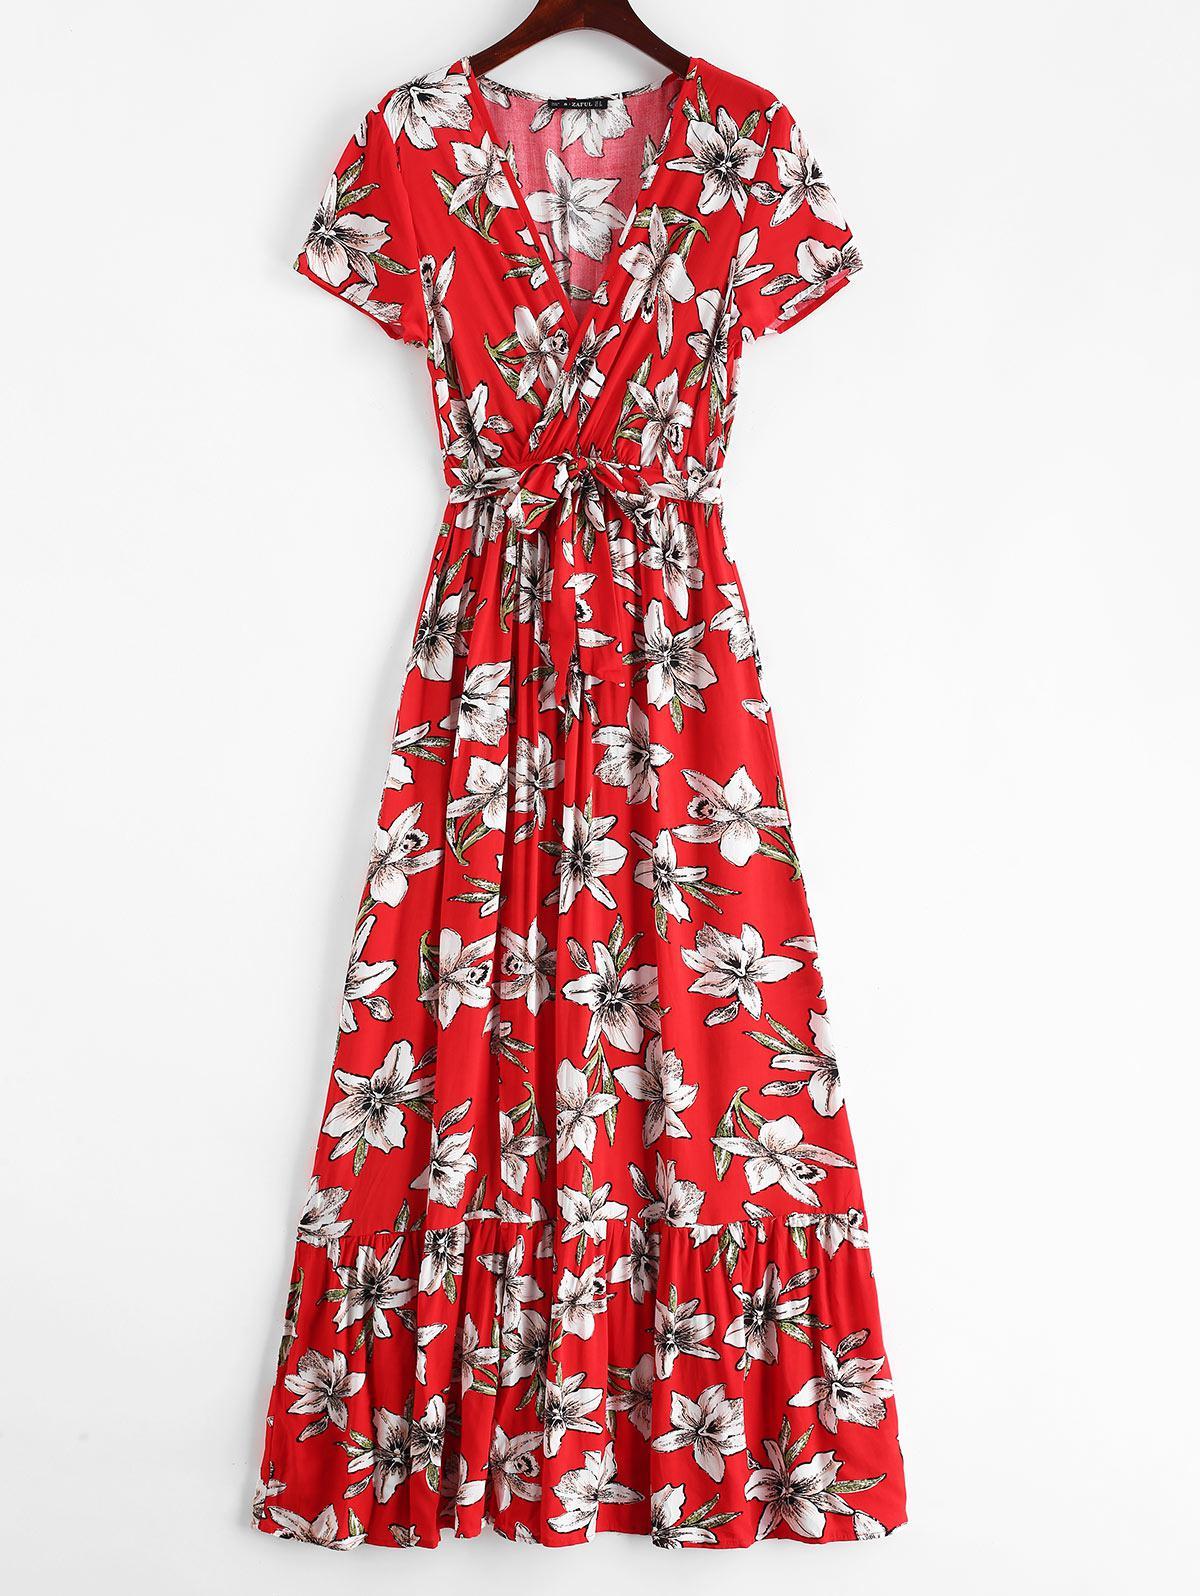 ZAFUL Surplice Floral Low Cut Slit Dress, Red